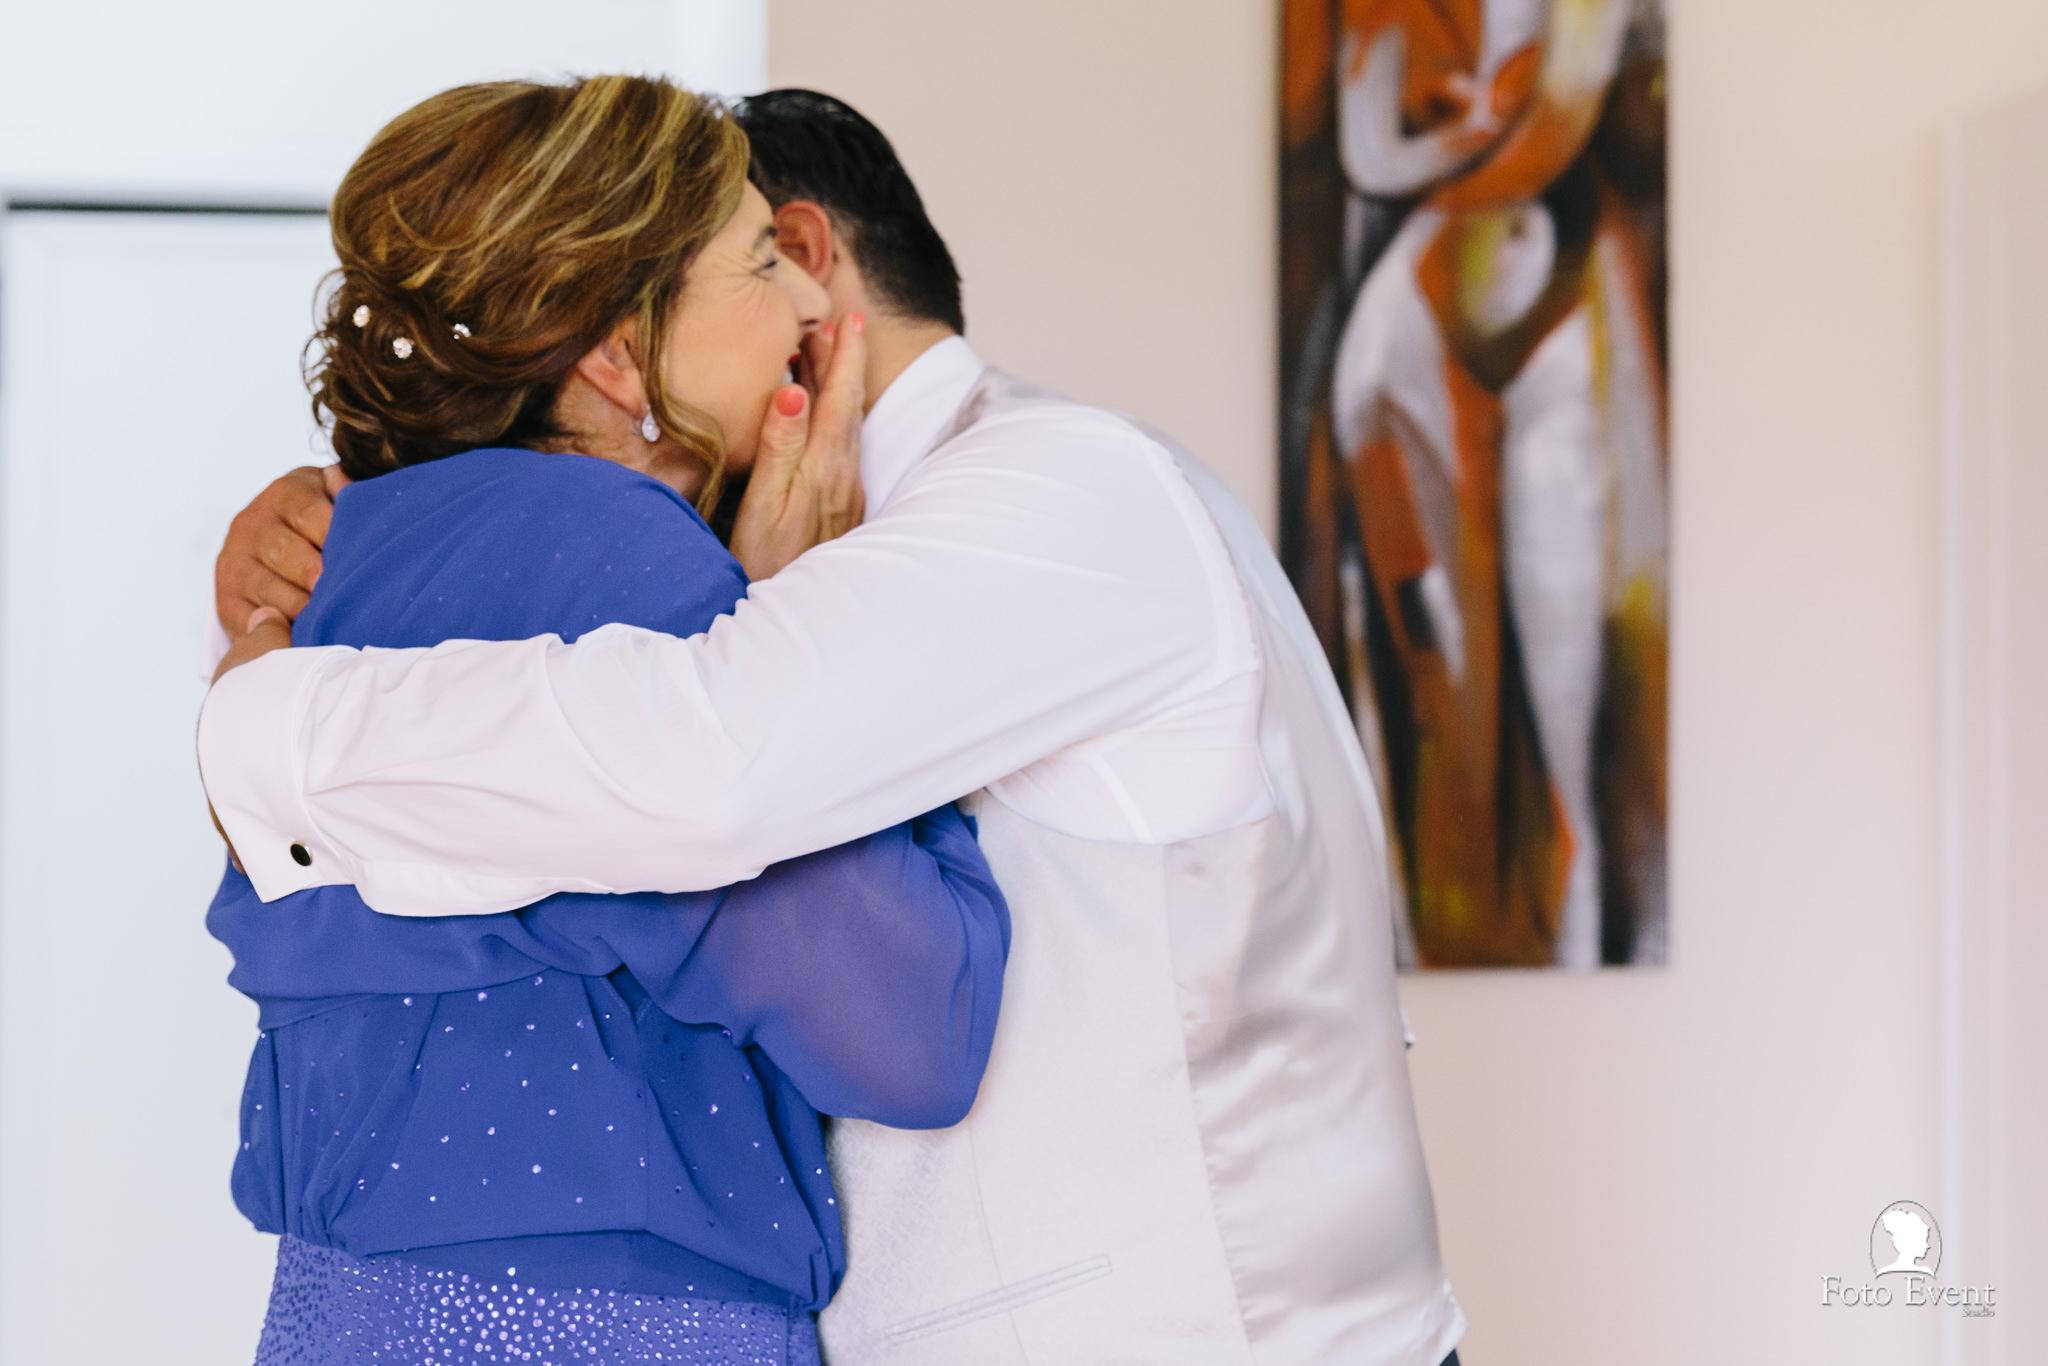 004-2019-09-09-Matrimonio-Dorotea-e-Alberto-Iemmolo-5DN-098